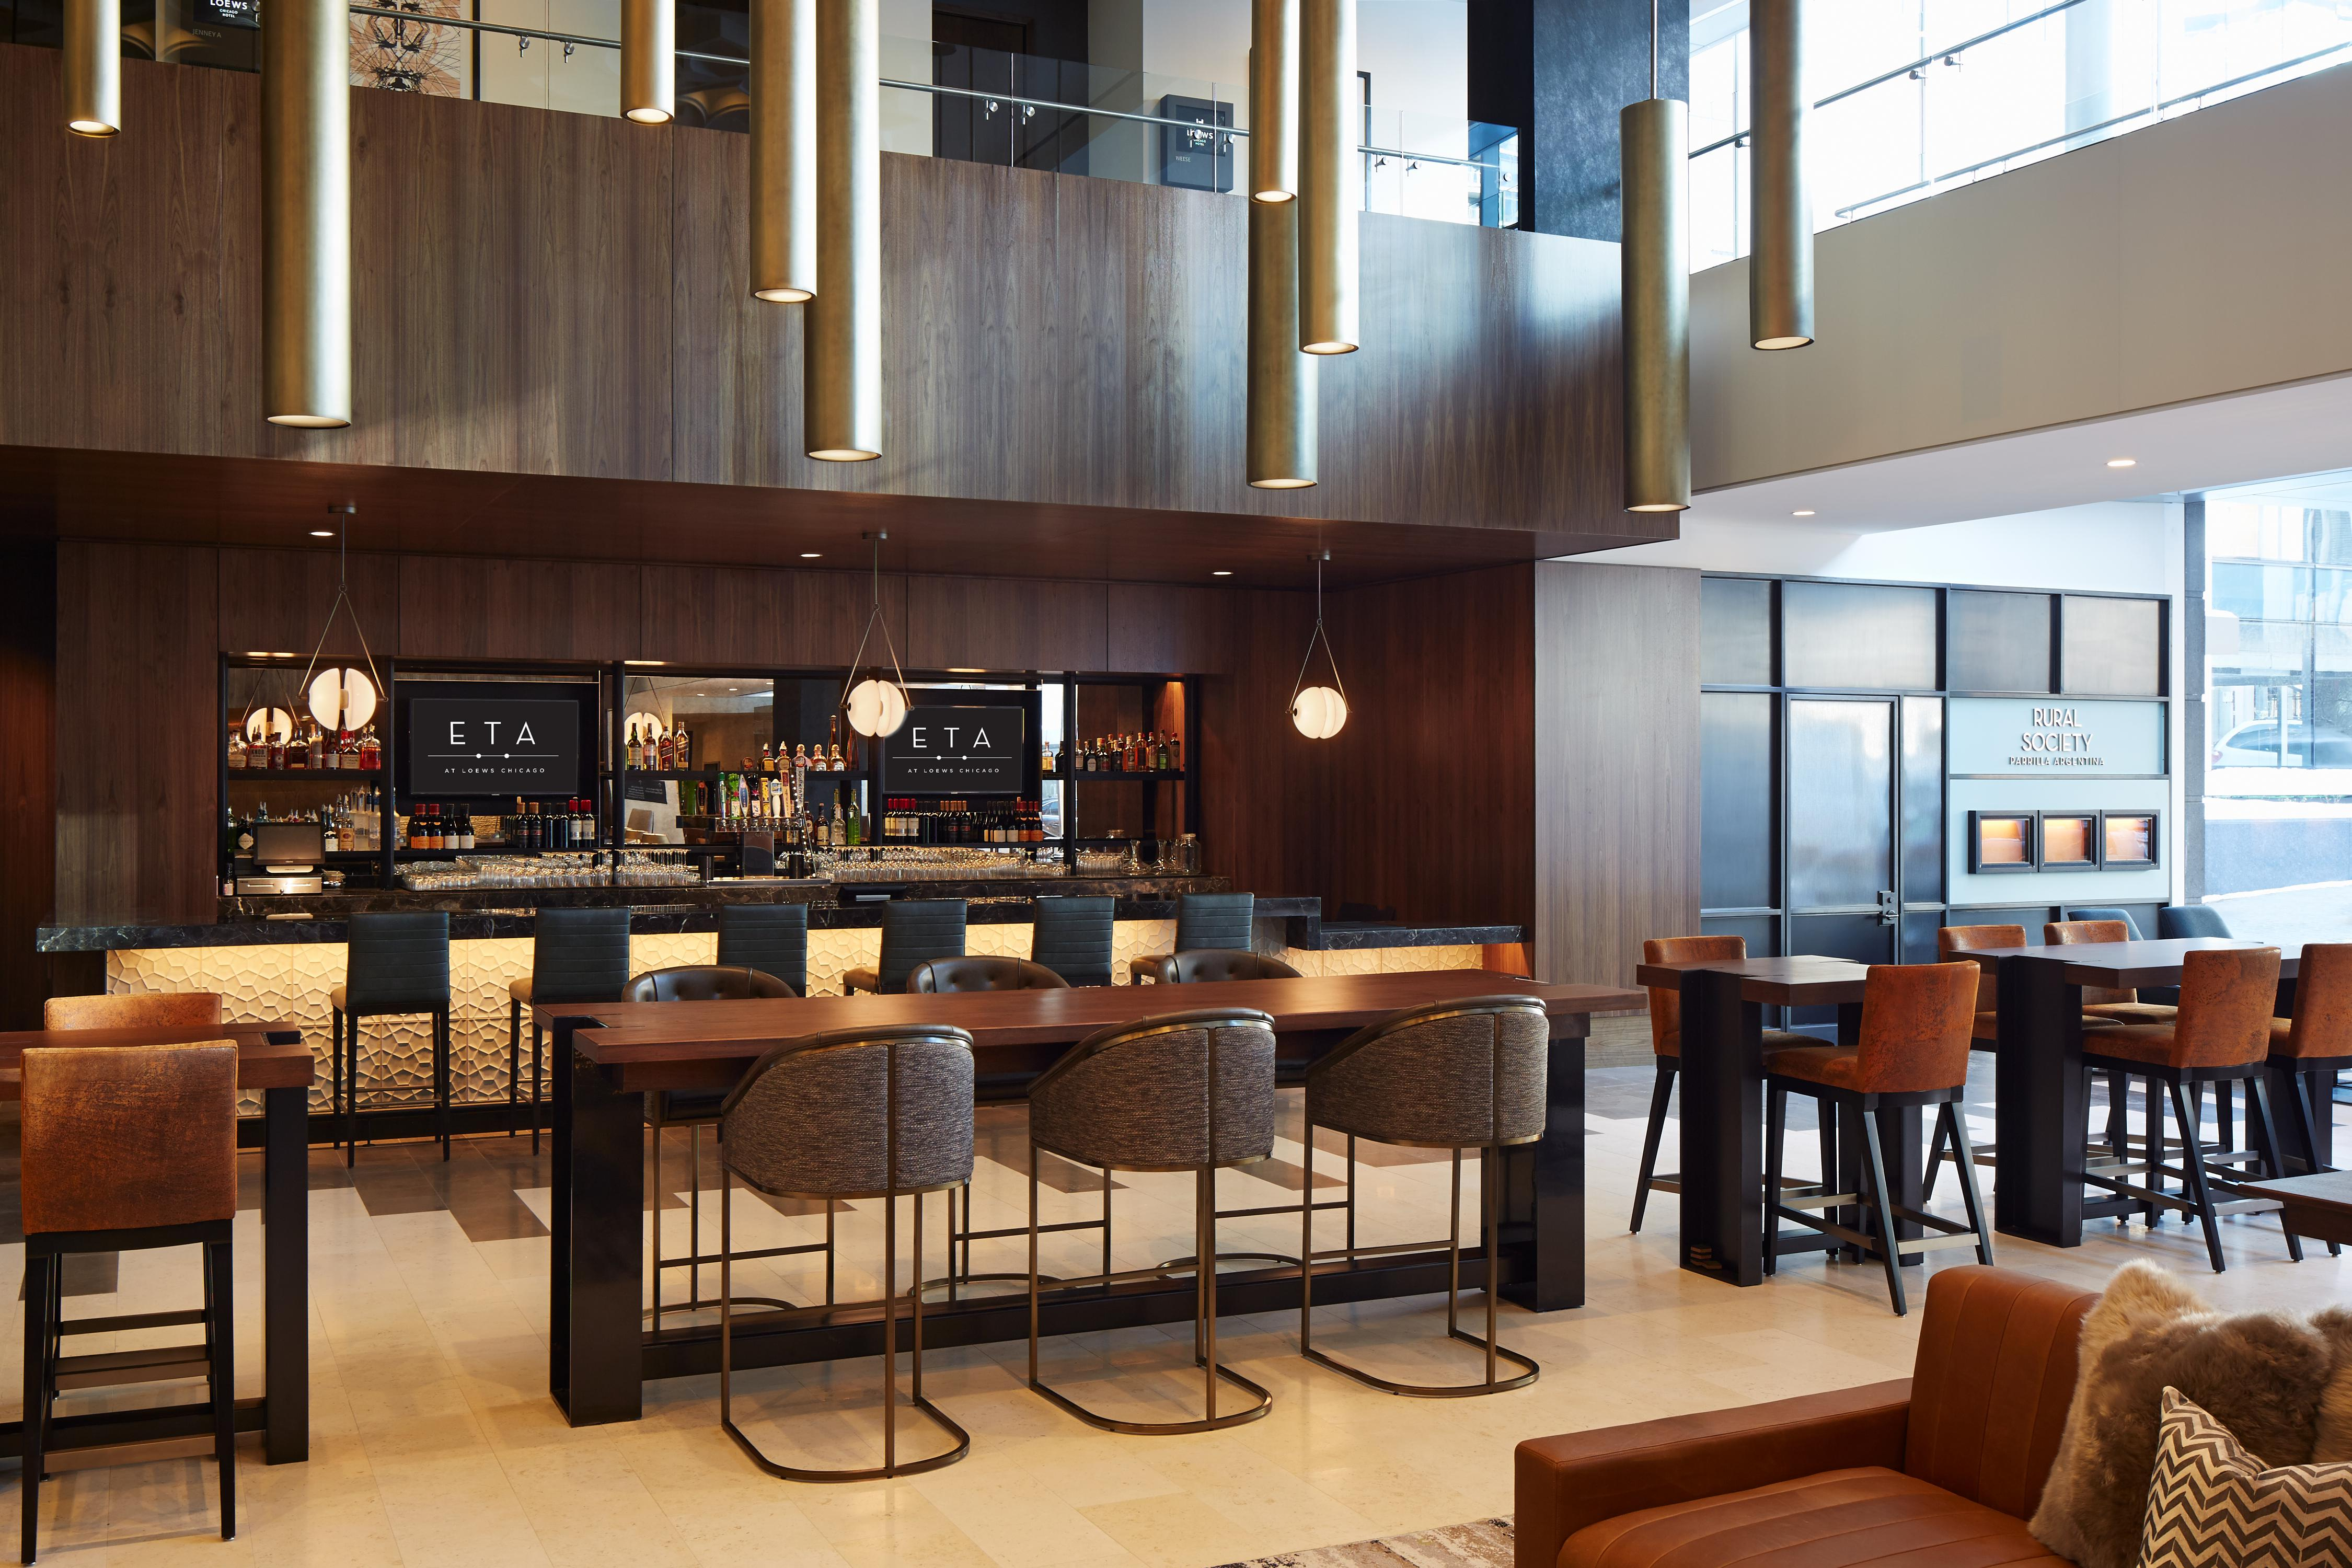 Loews Chicago Hotel Bar